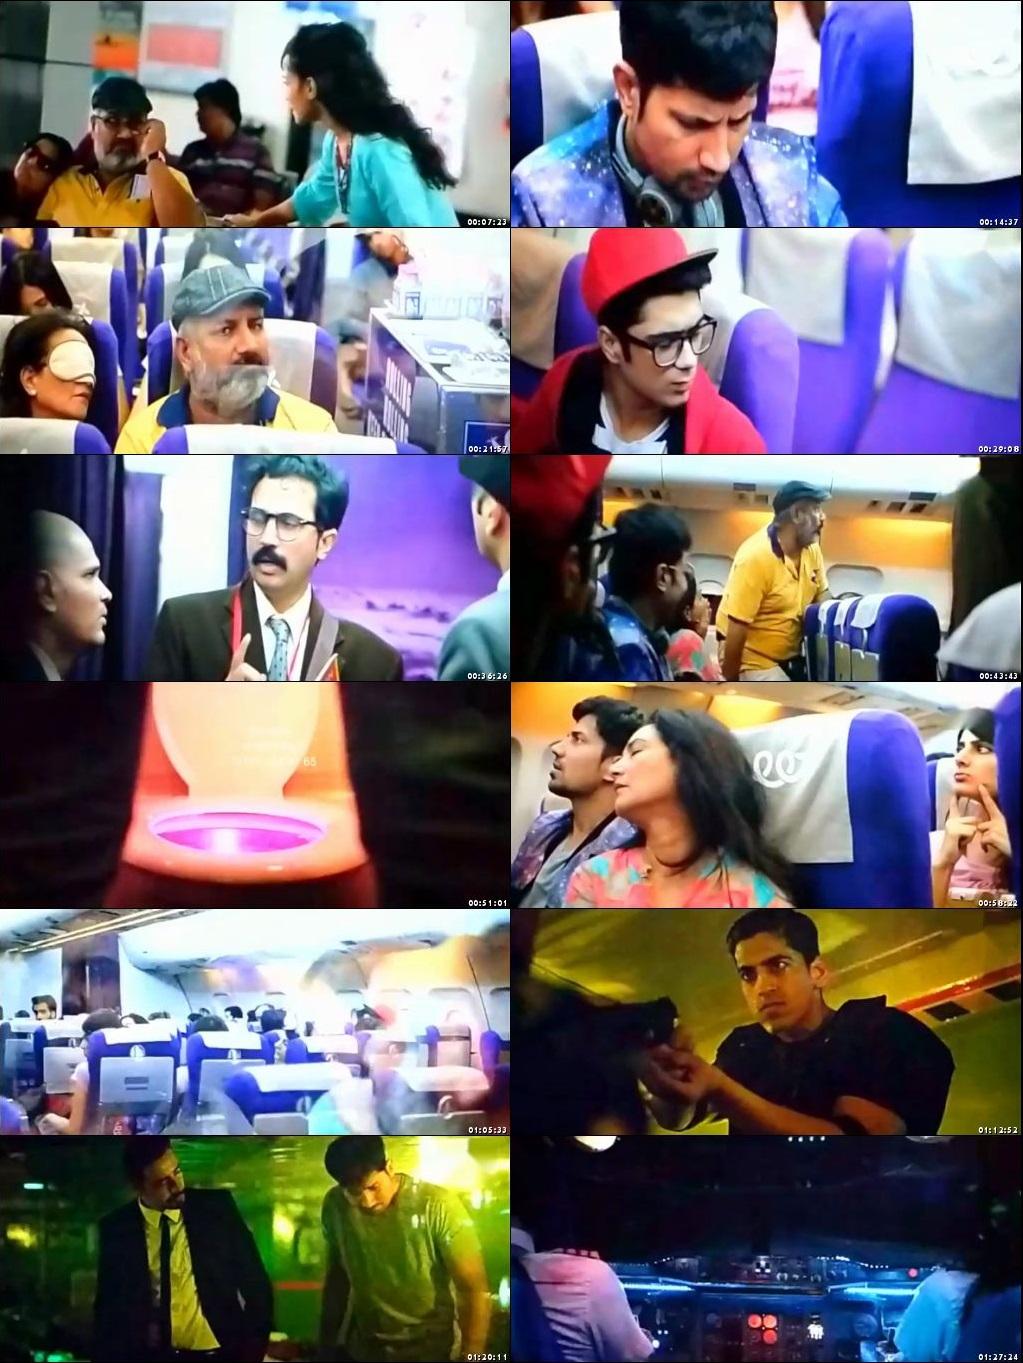 High Jack 2018 Full Movie Download 720p HDRip, BluRay, DVDRip, mkv, Mp4 1080p Full Hd